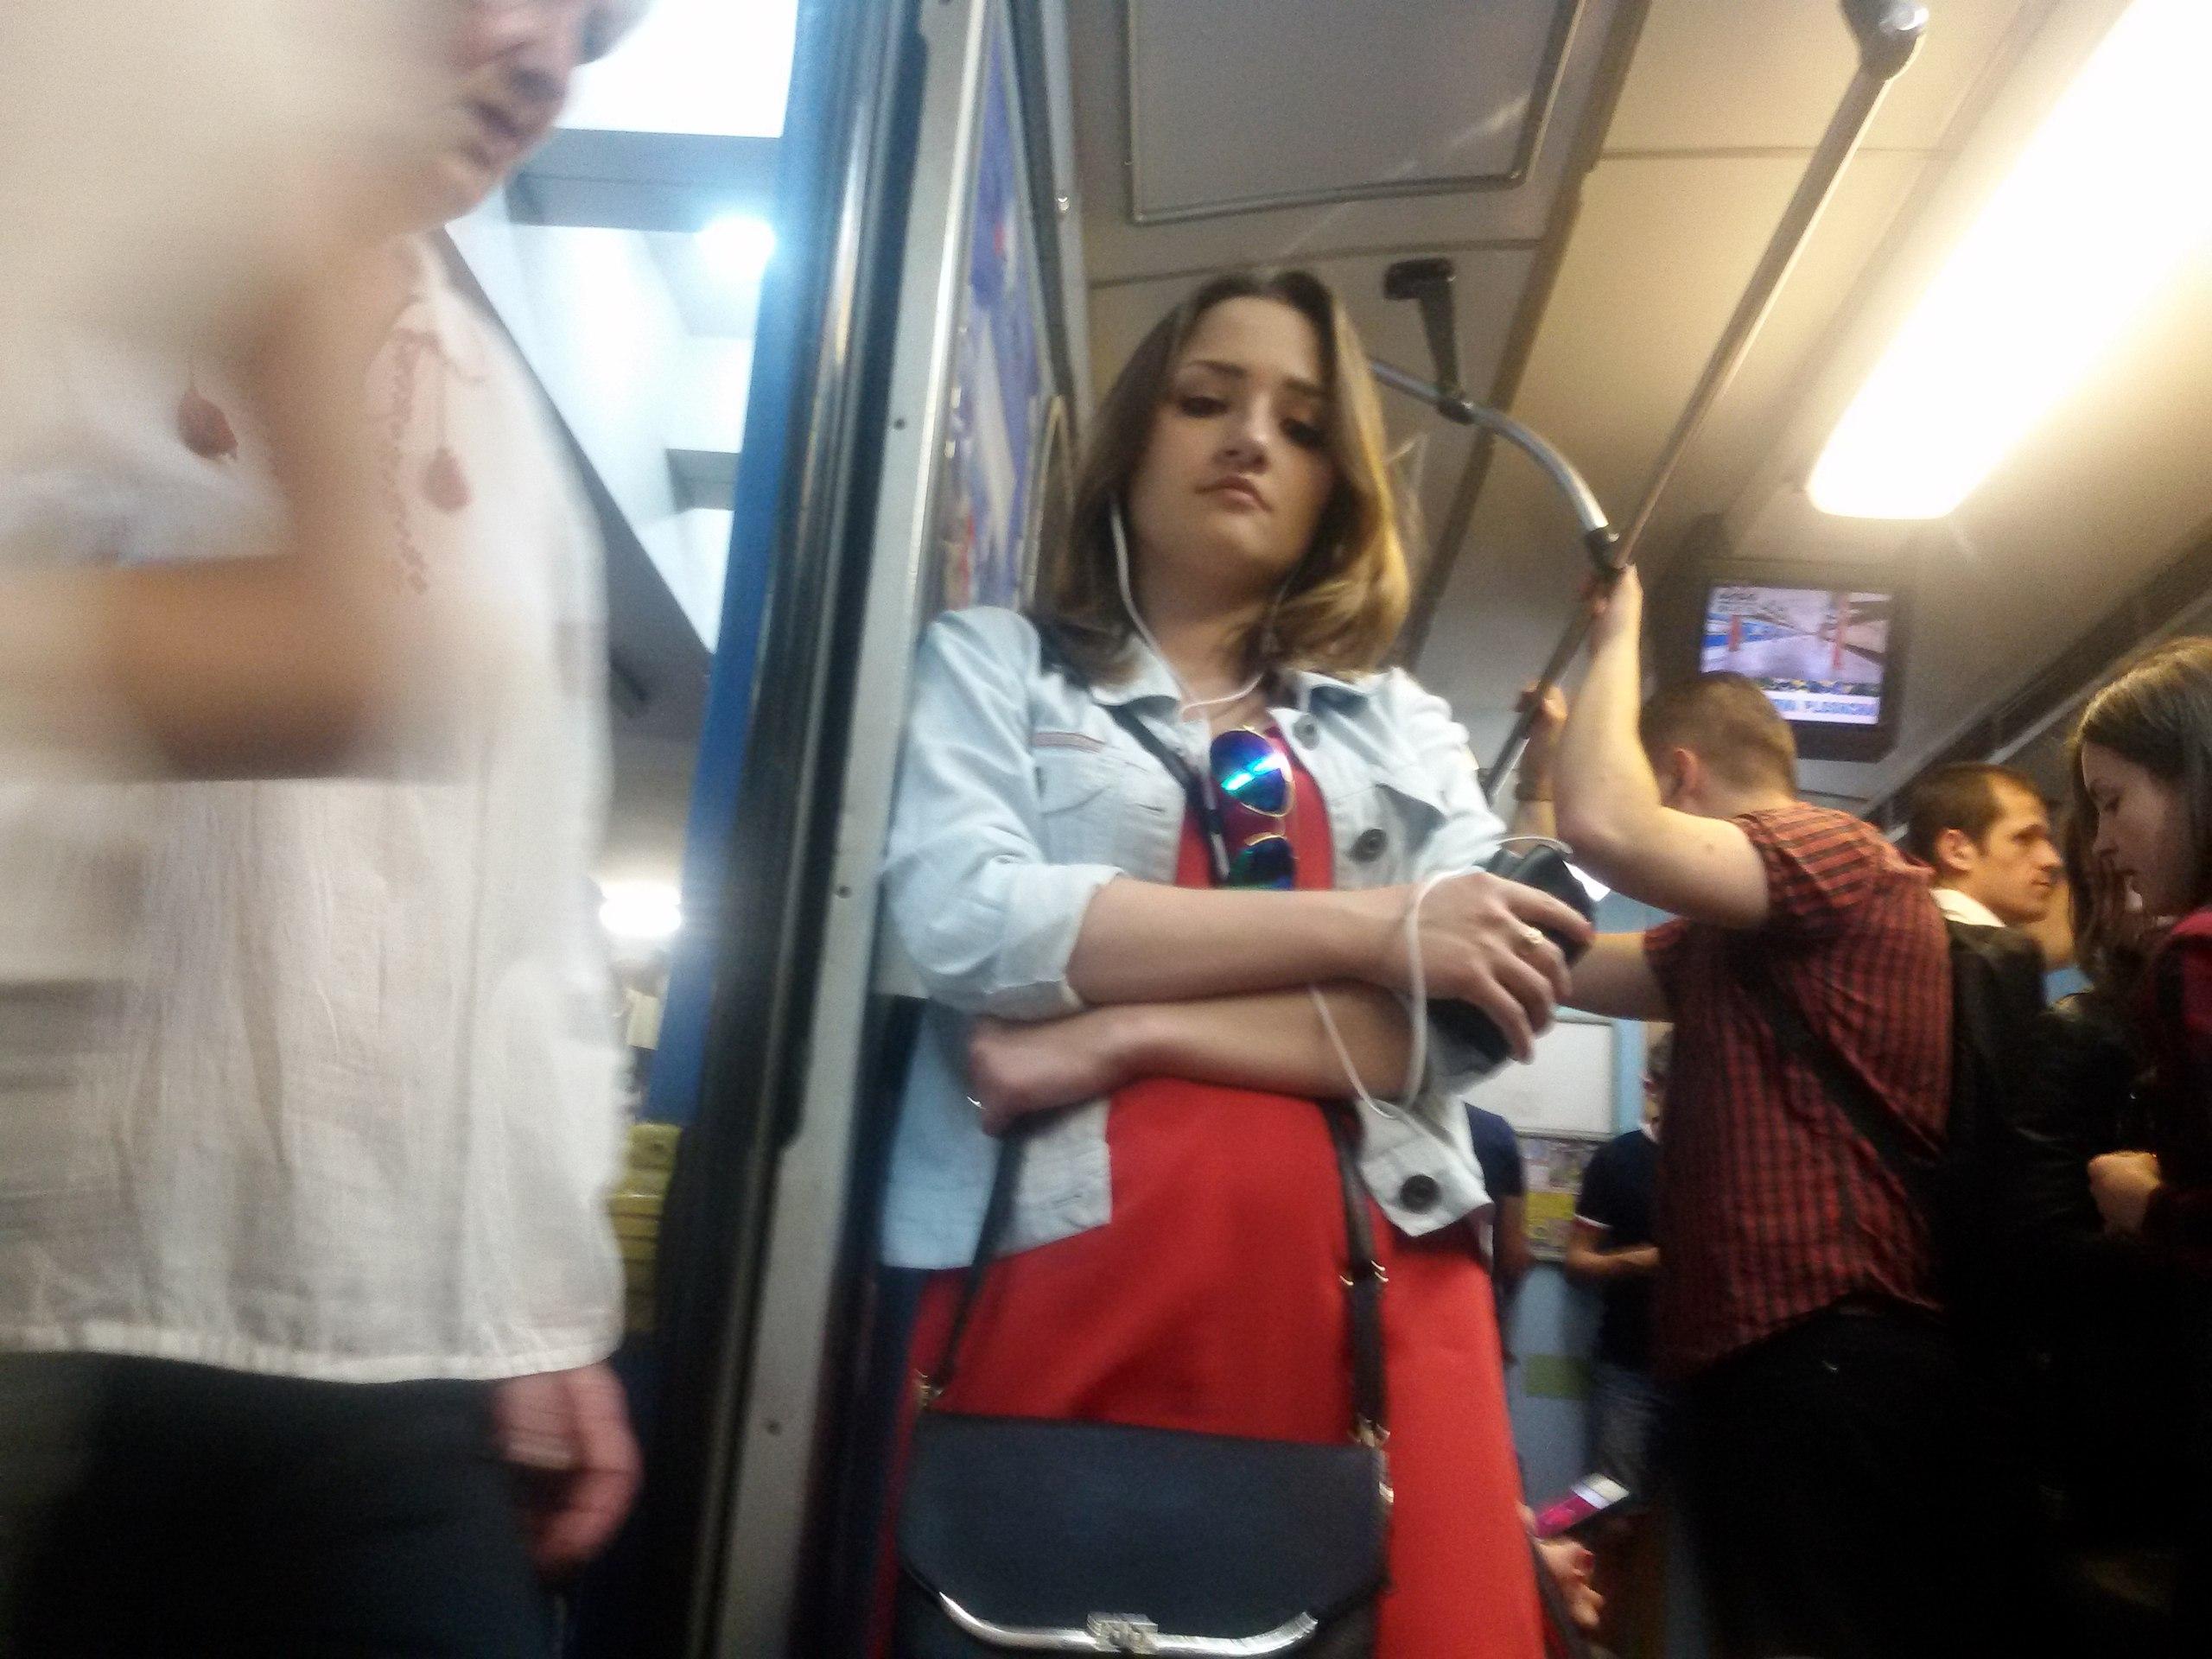 Крутая девушка в метро фото 803-843